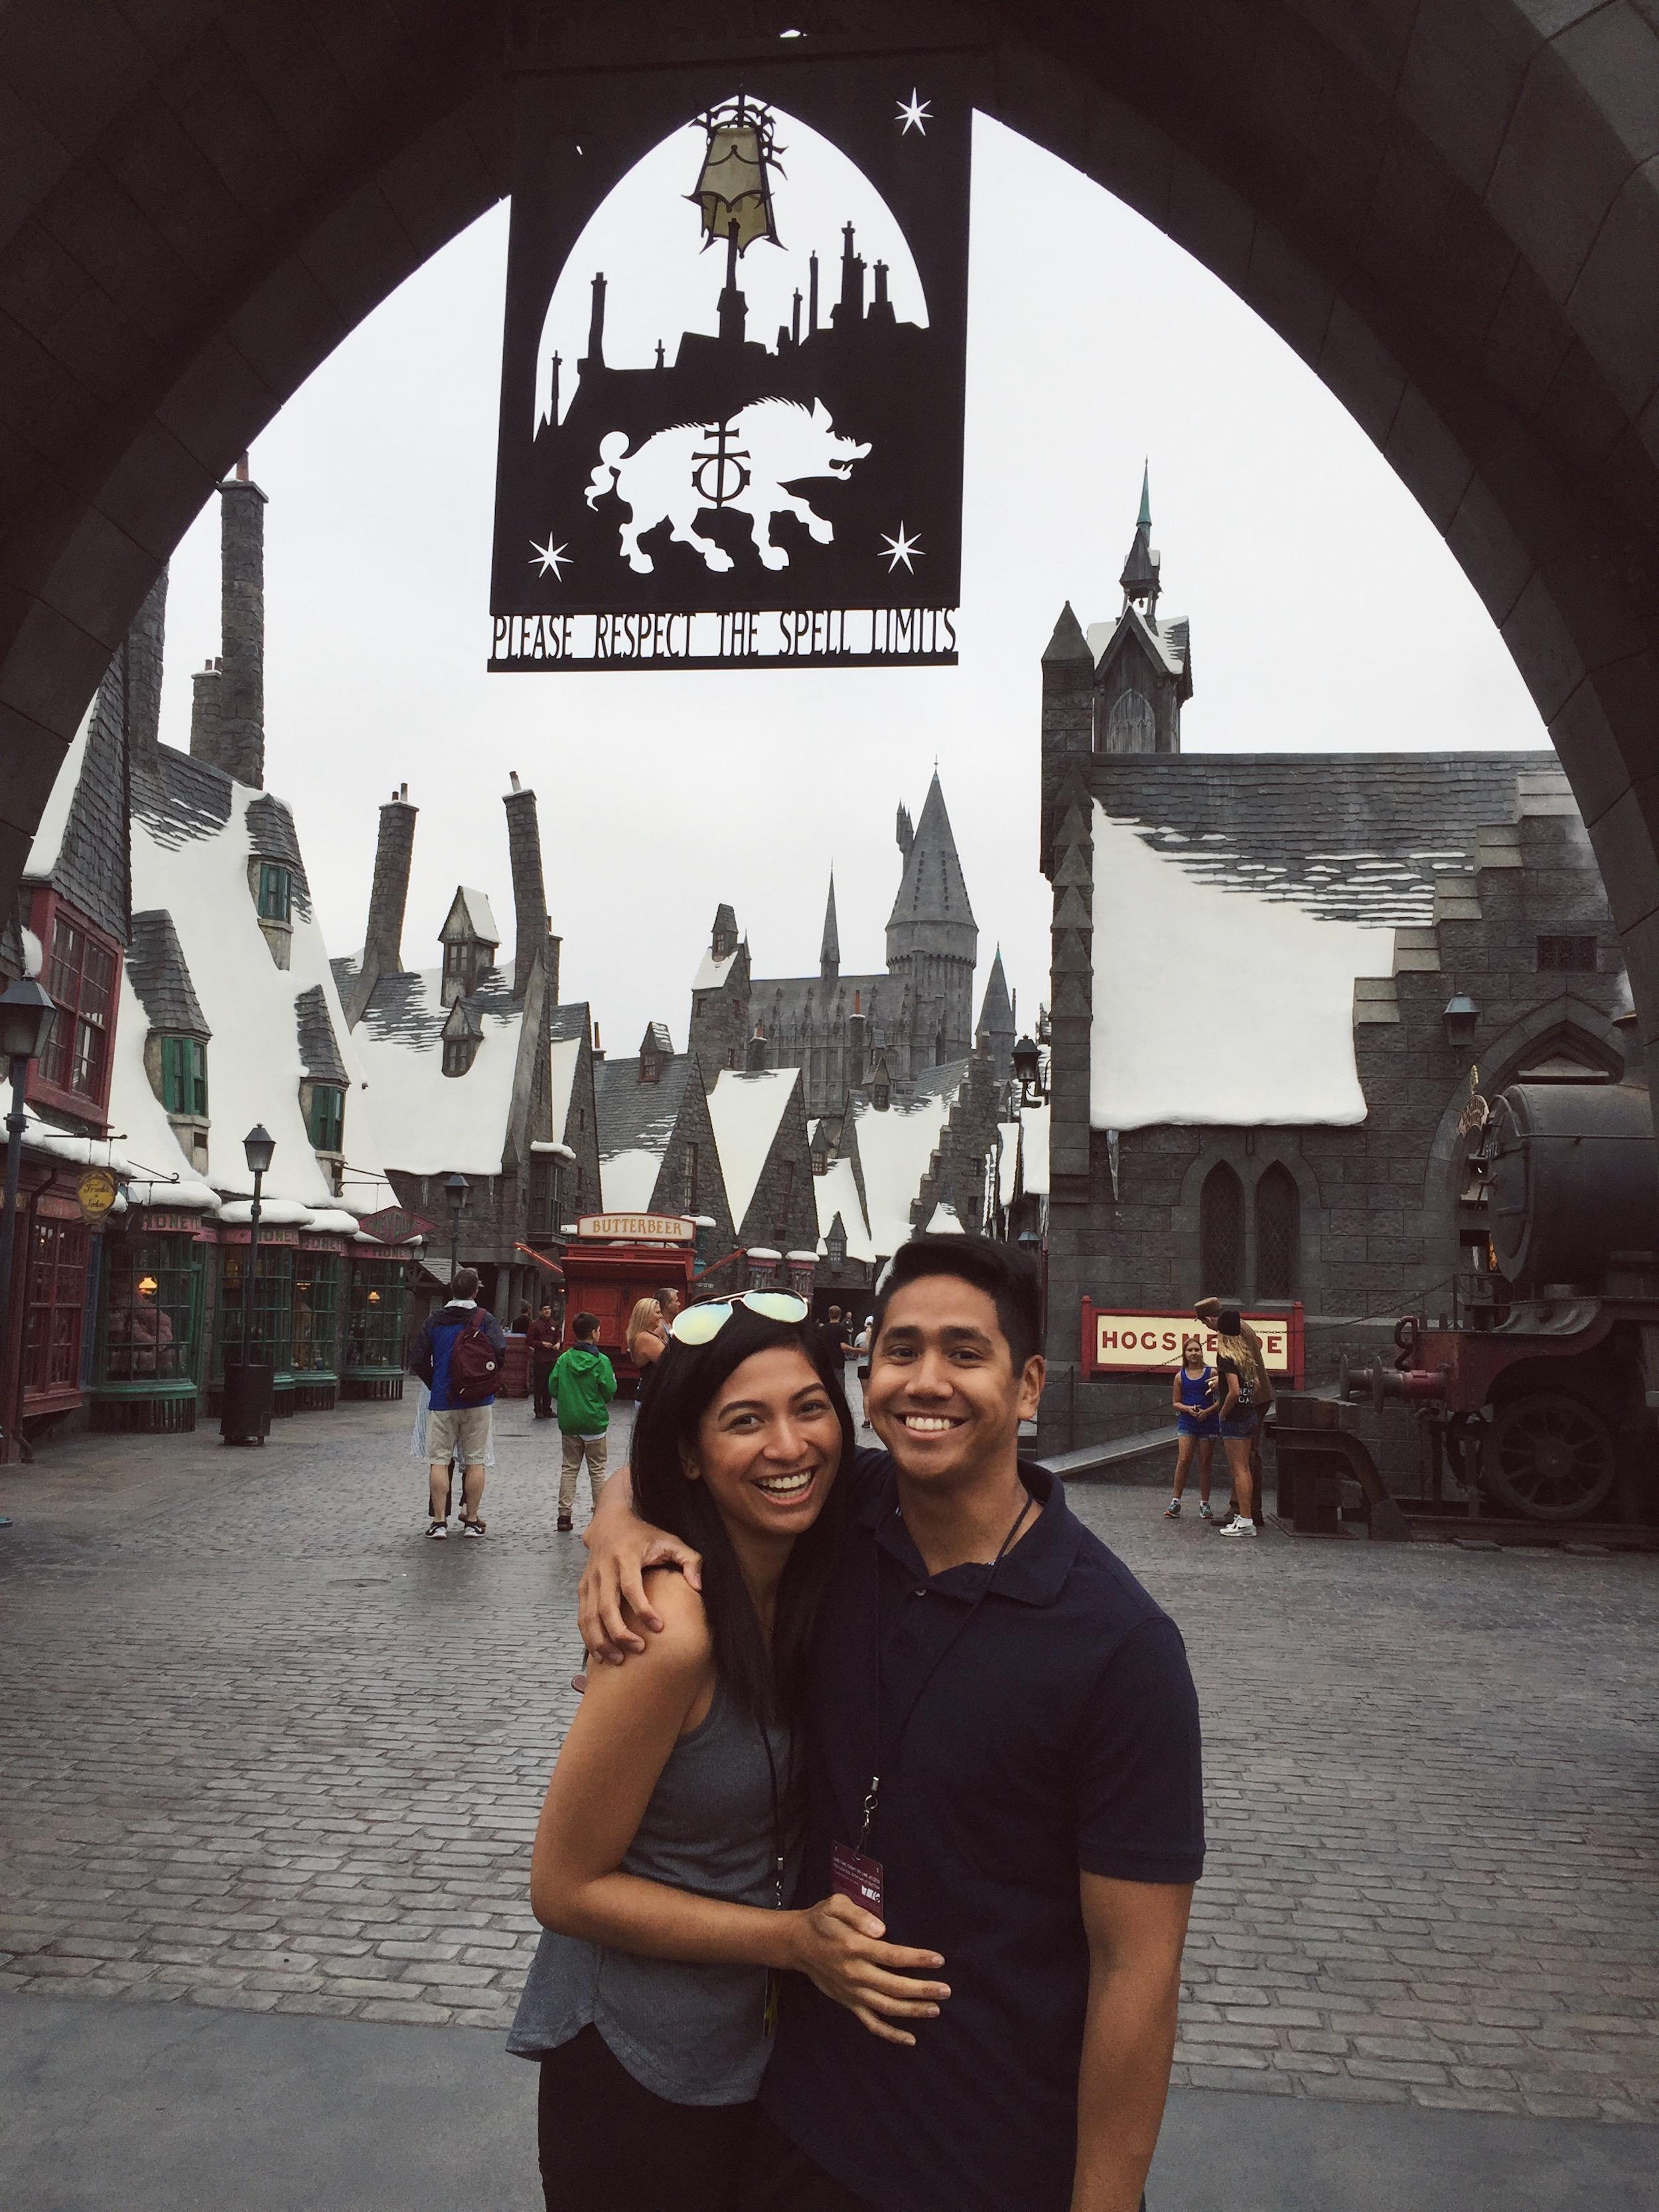 roxci vergs harry potter world of wizardry universal studios los angeles